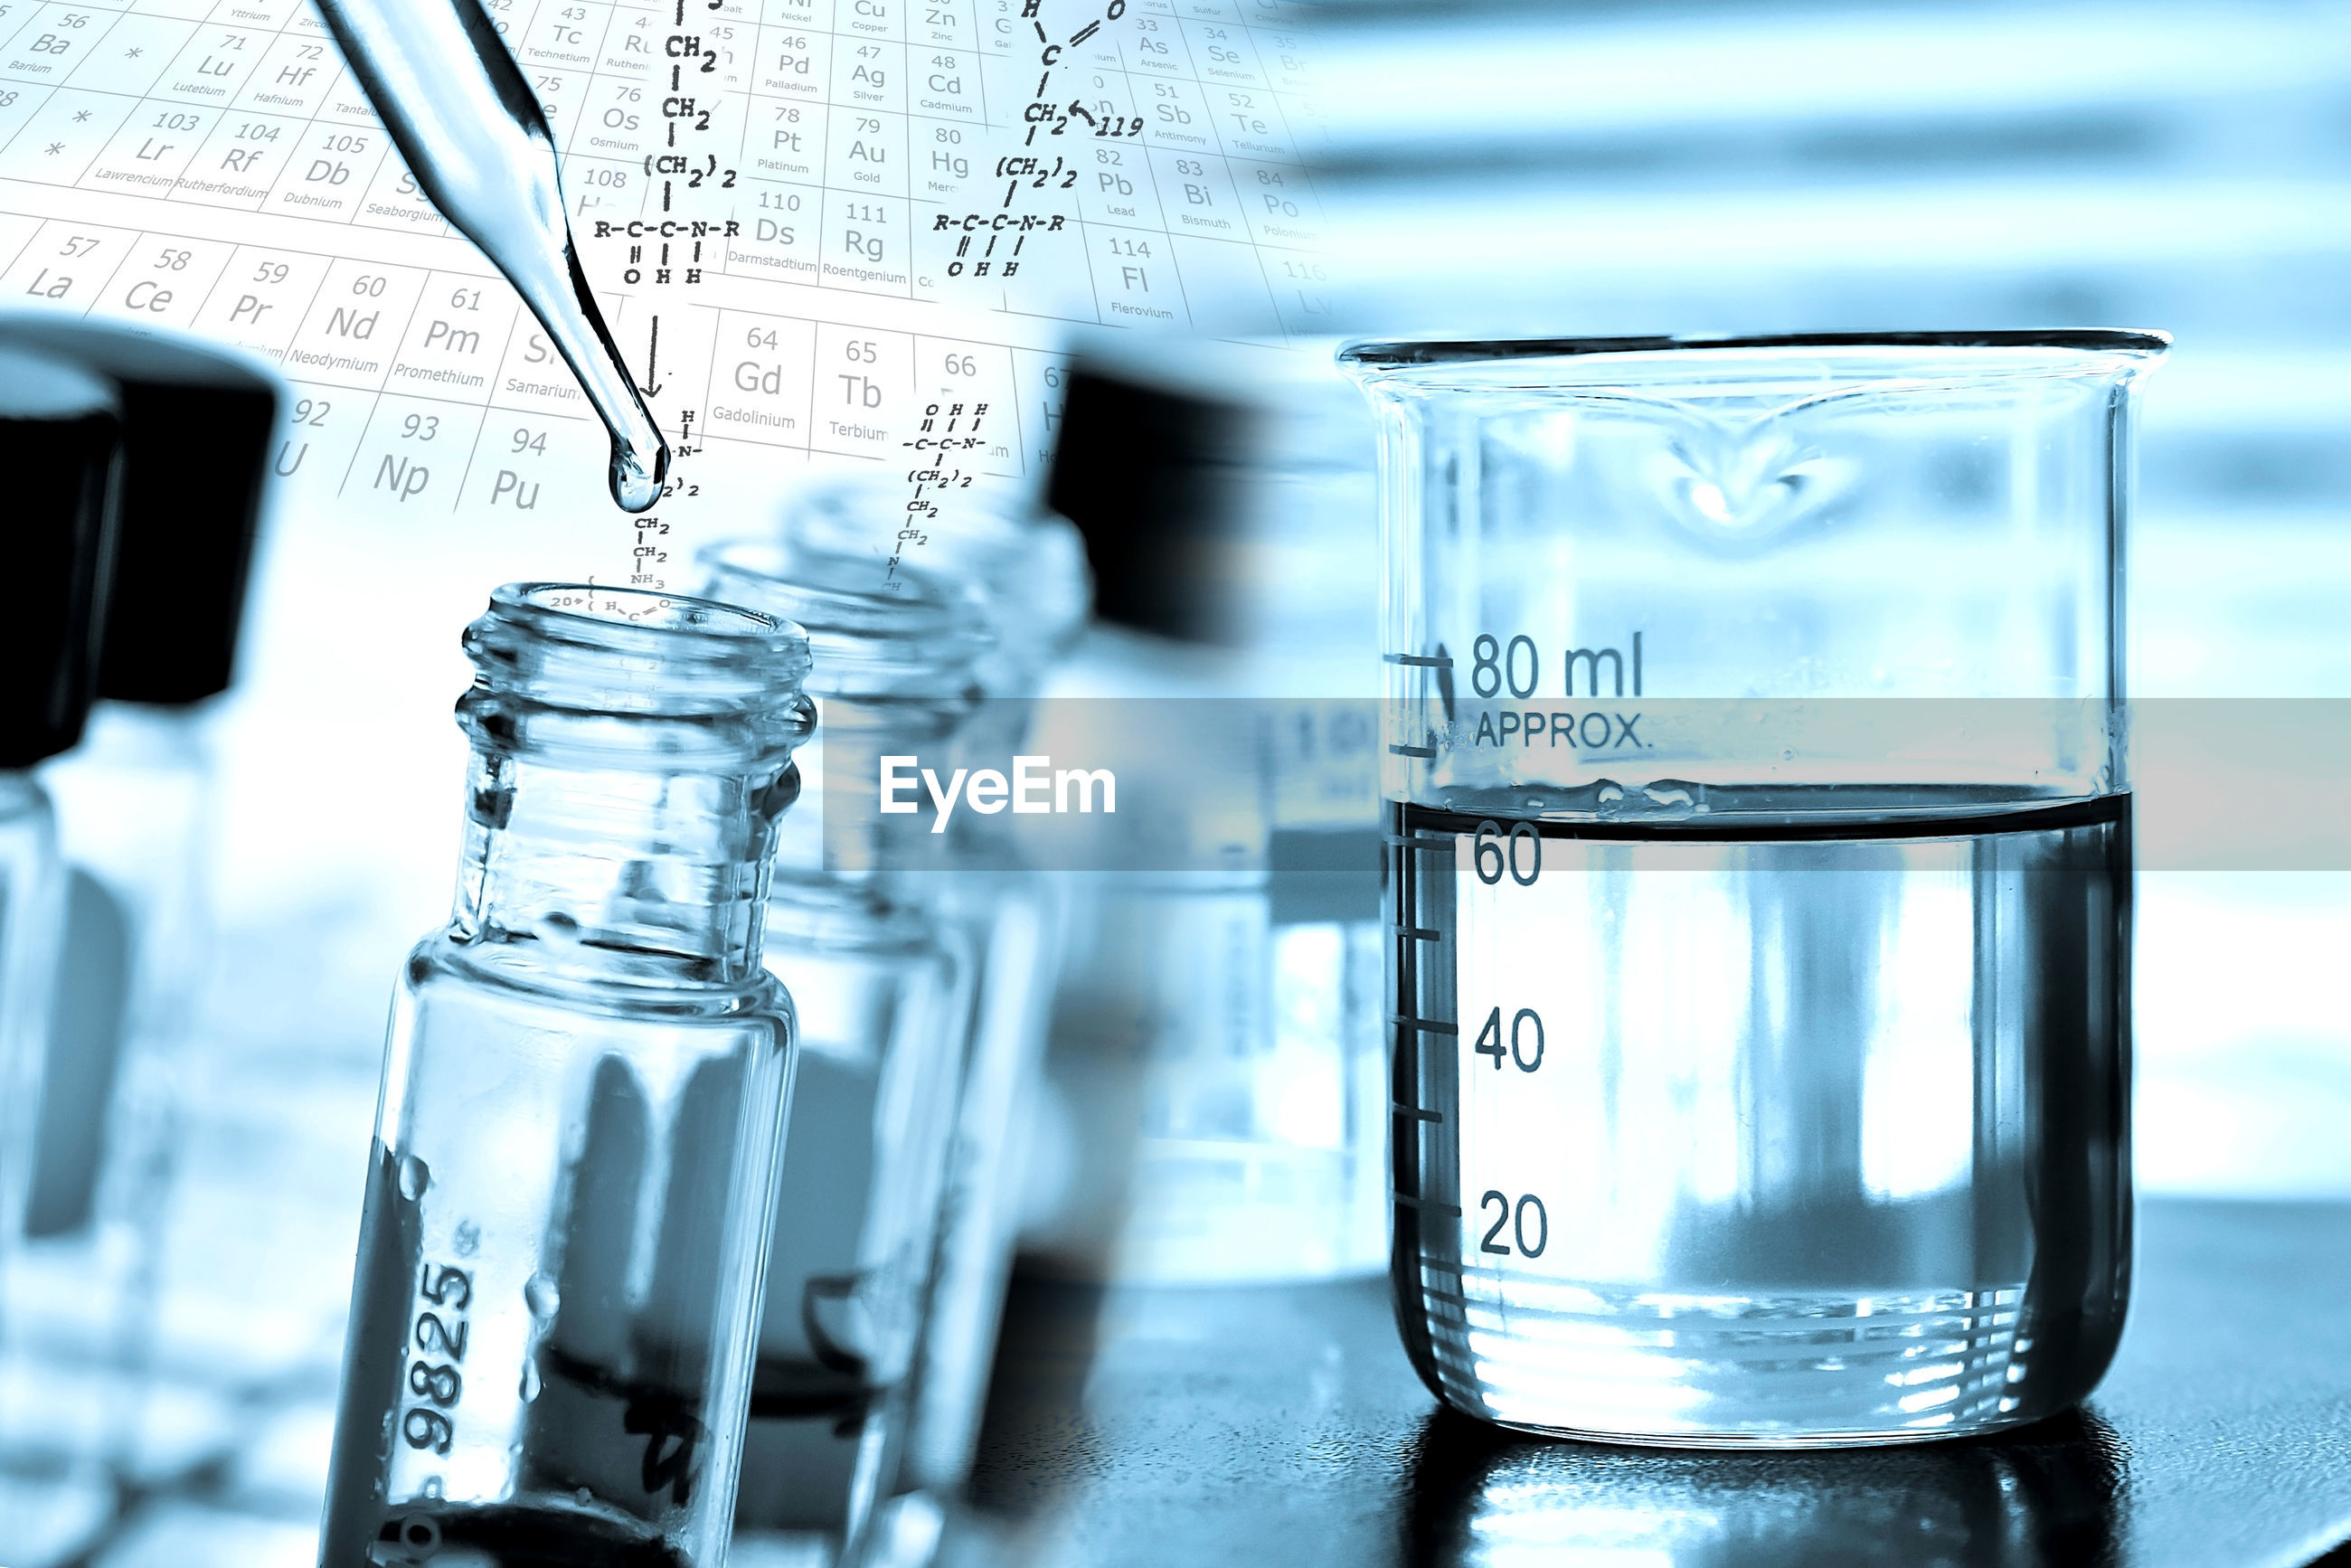 Close-up of laboratory glassware